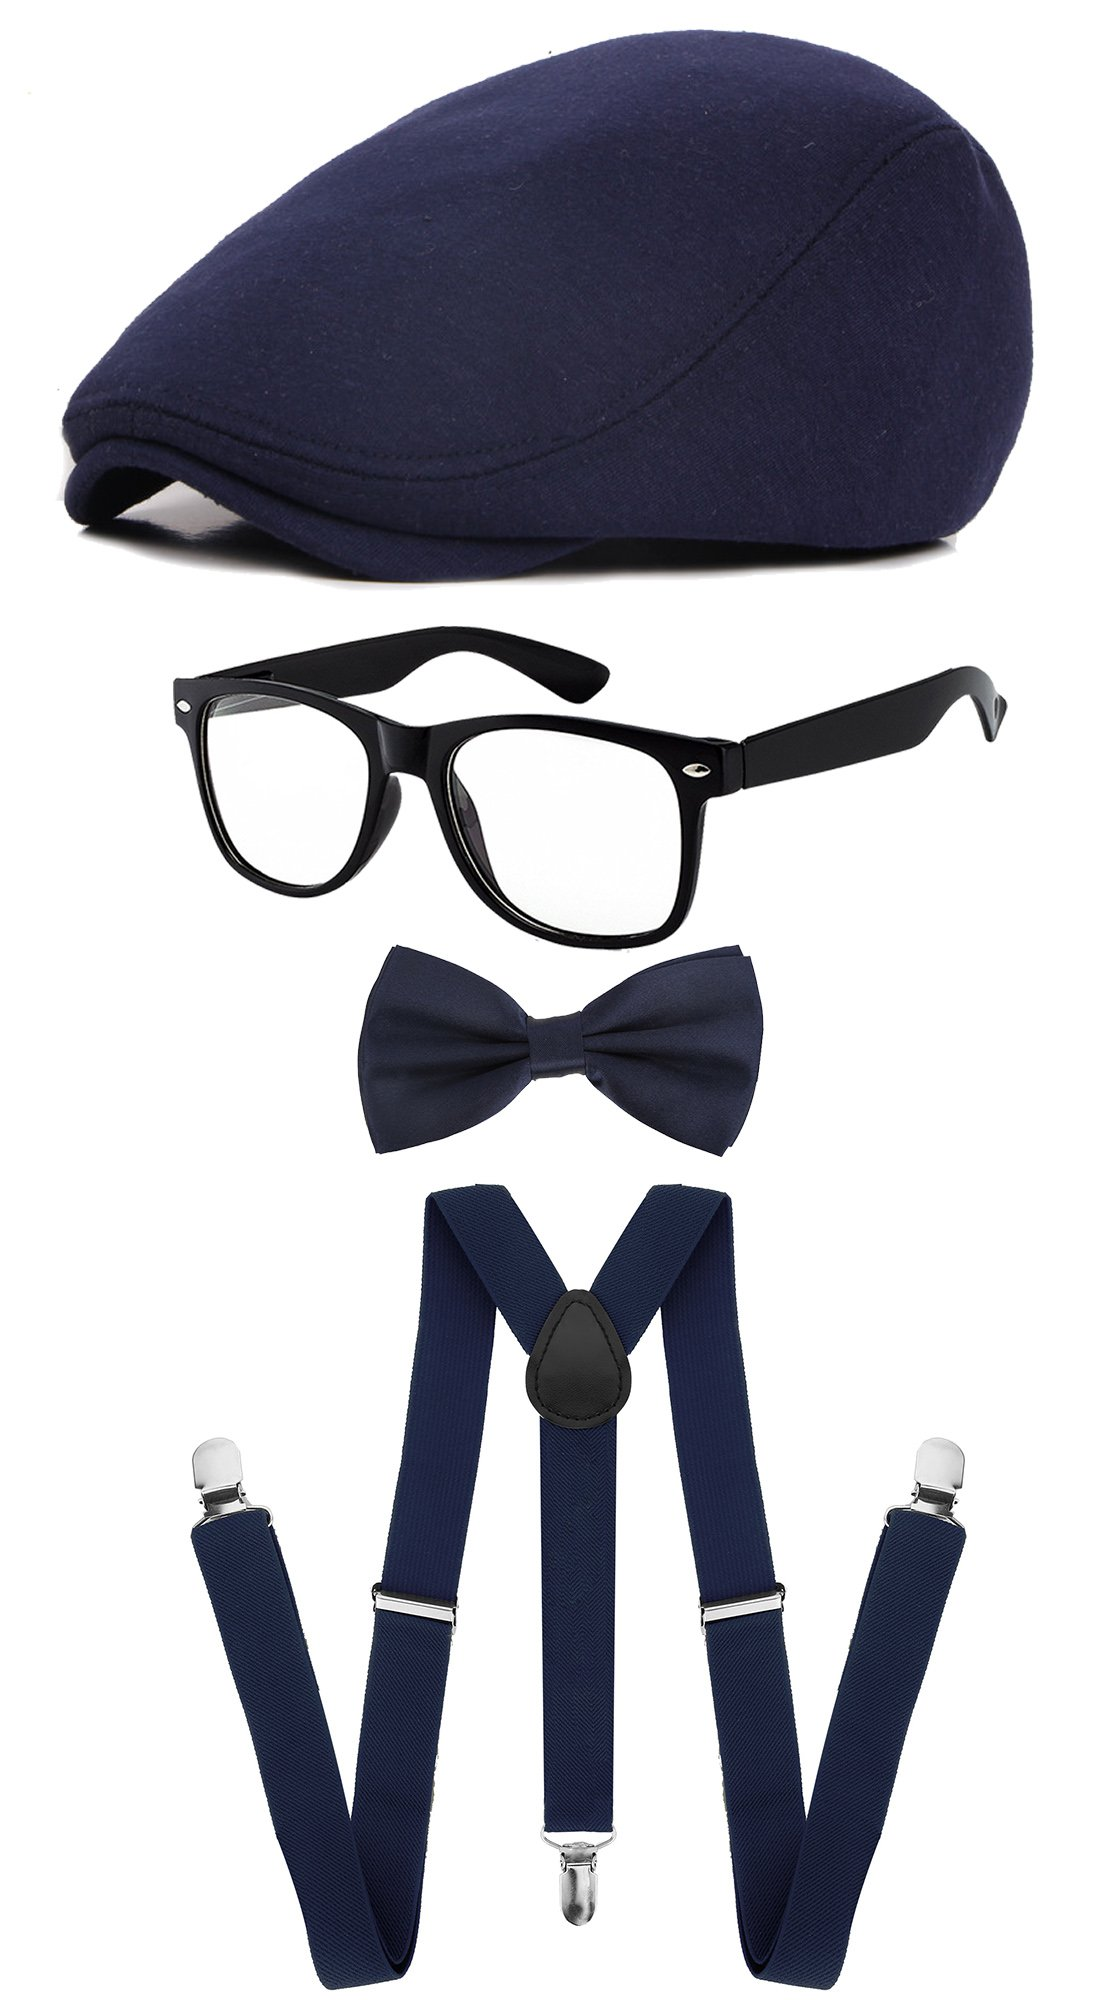 Classic Gatsby Newsboy Ivy Hat,Suspenders Y-Back Trouser Braces,Pre Tied Bow Tie,Non Prescription Glasses (Cotton - Navy)